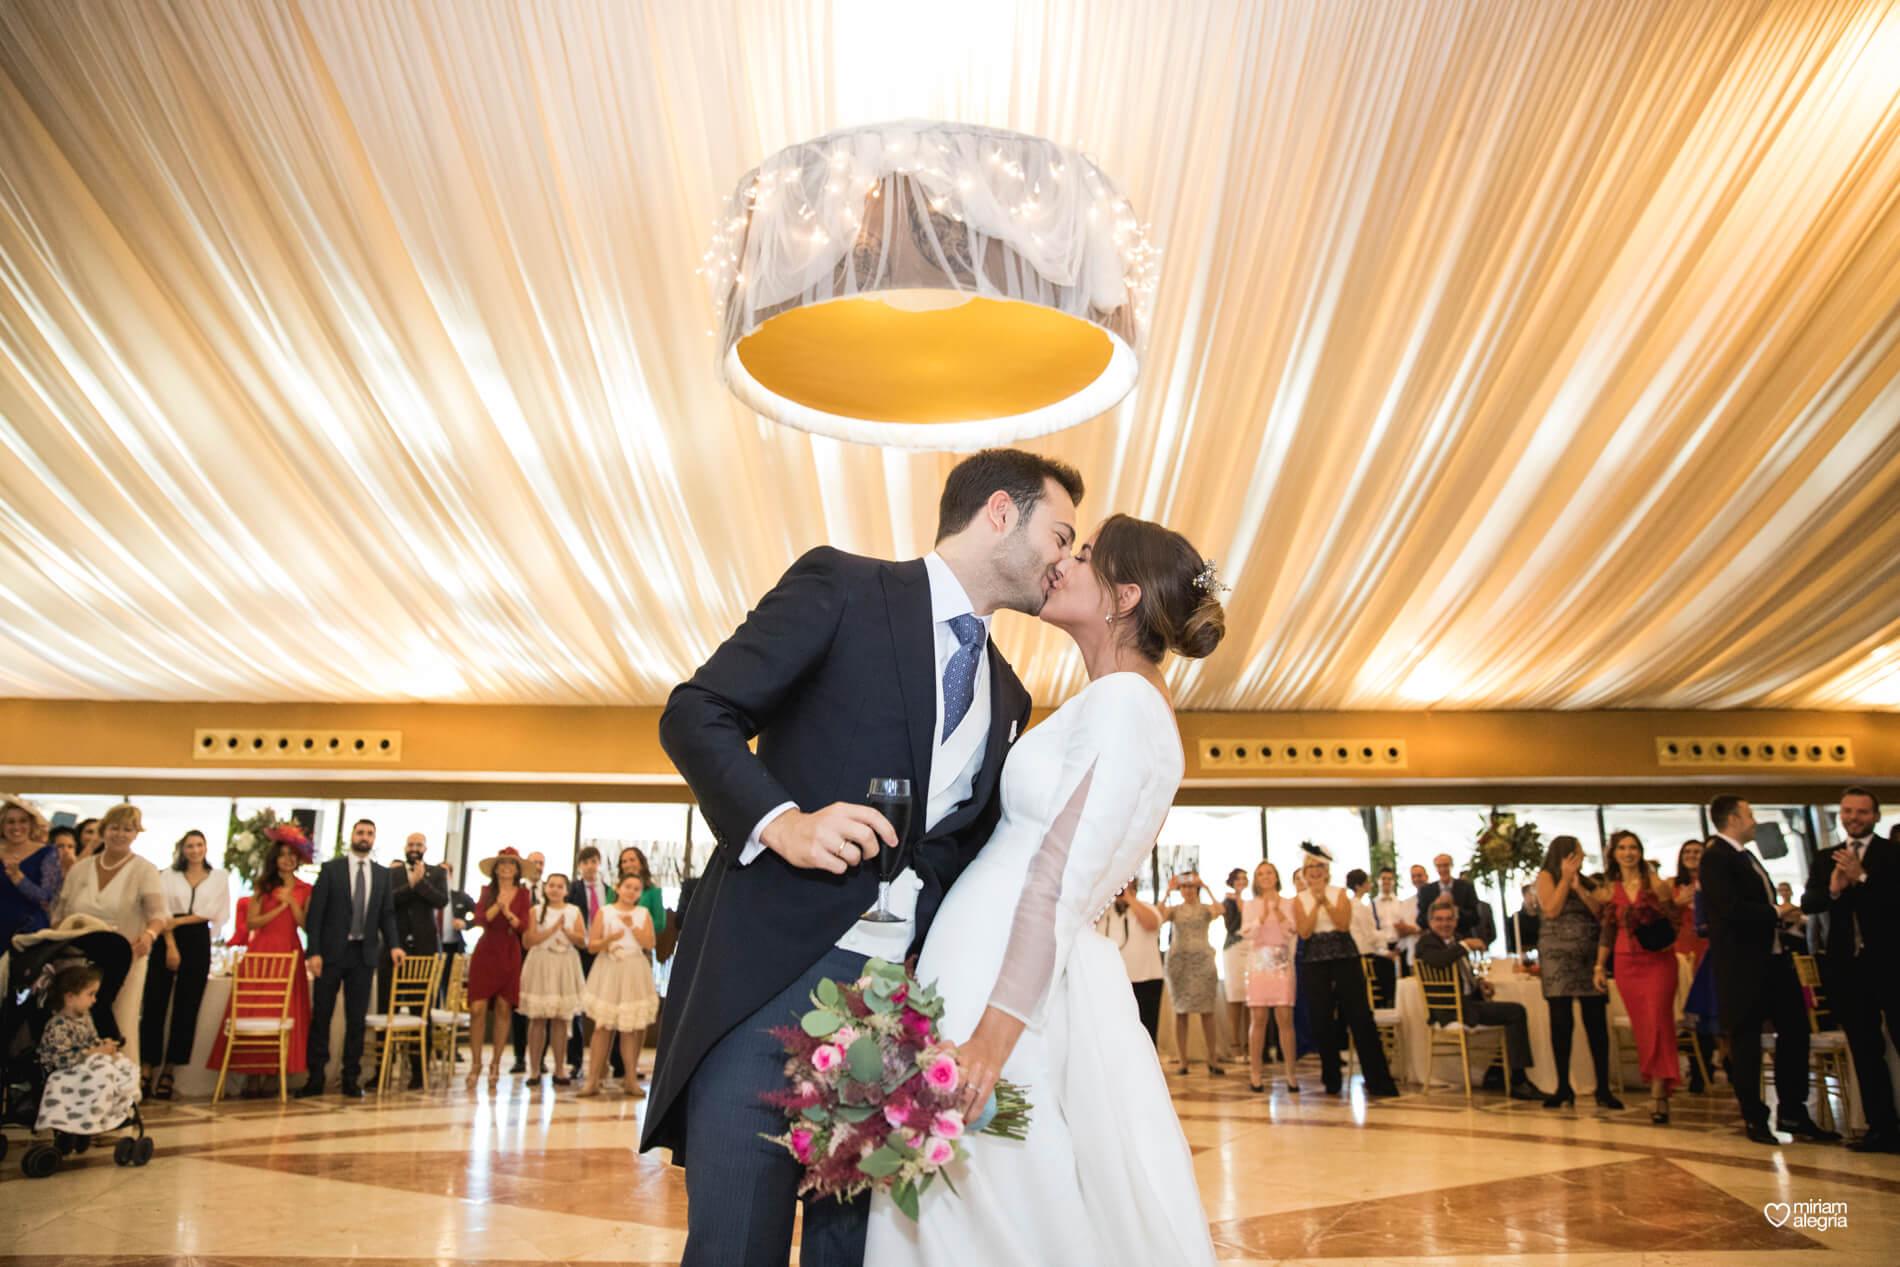 vestido-de-novia-paula-del-vas-miriam-alegria-fotografos-boda-murcia-119